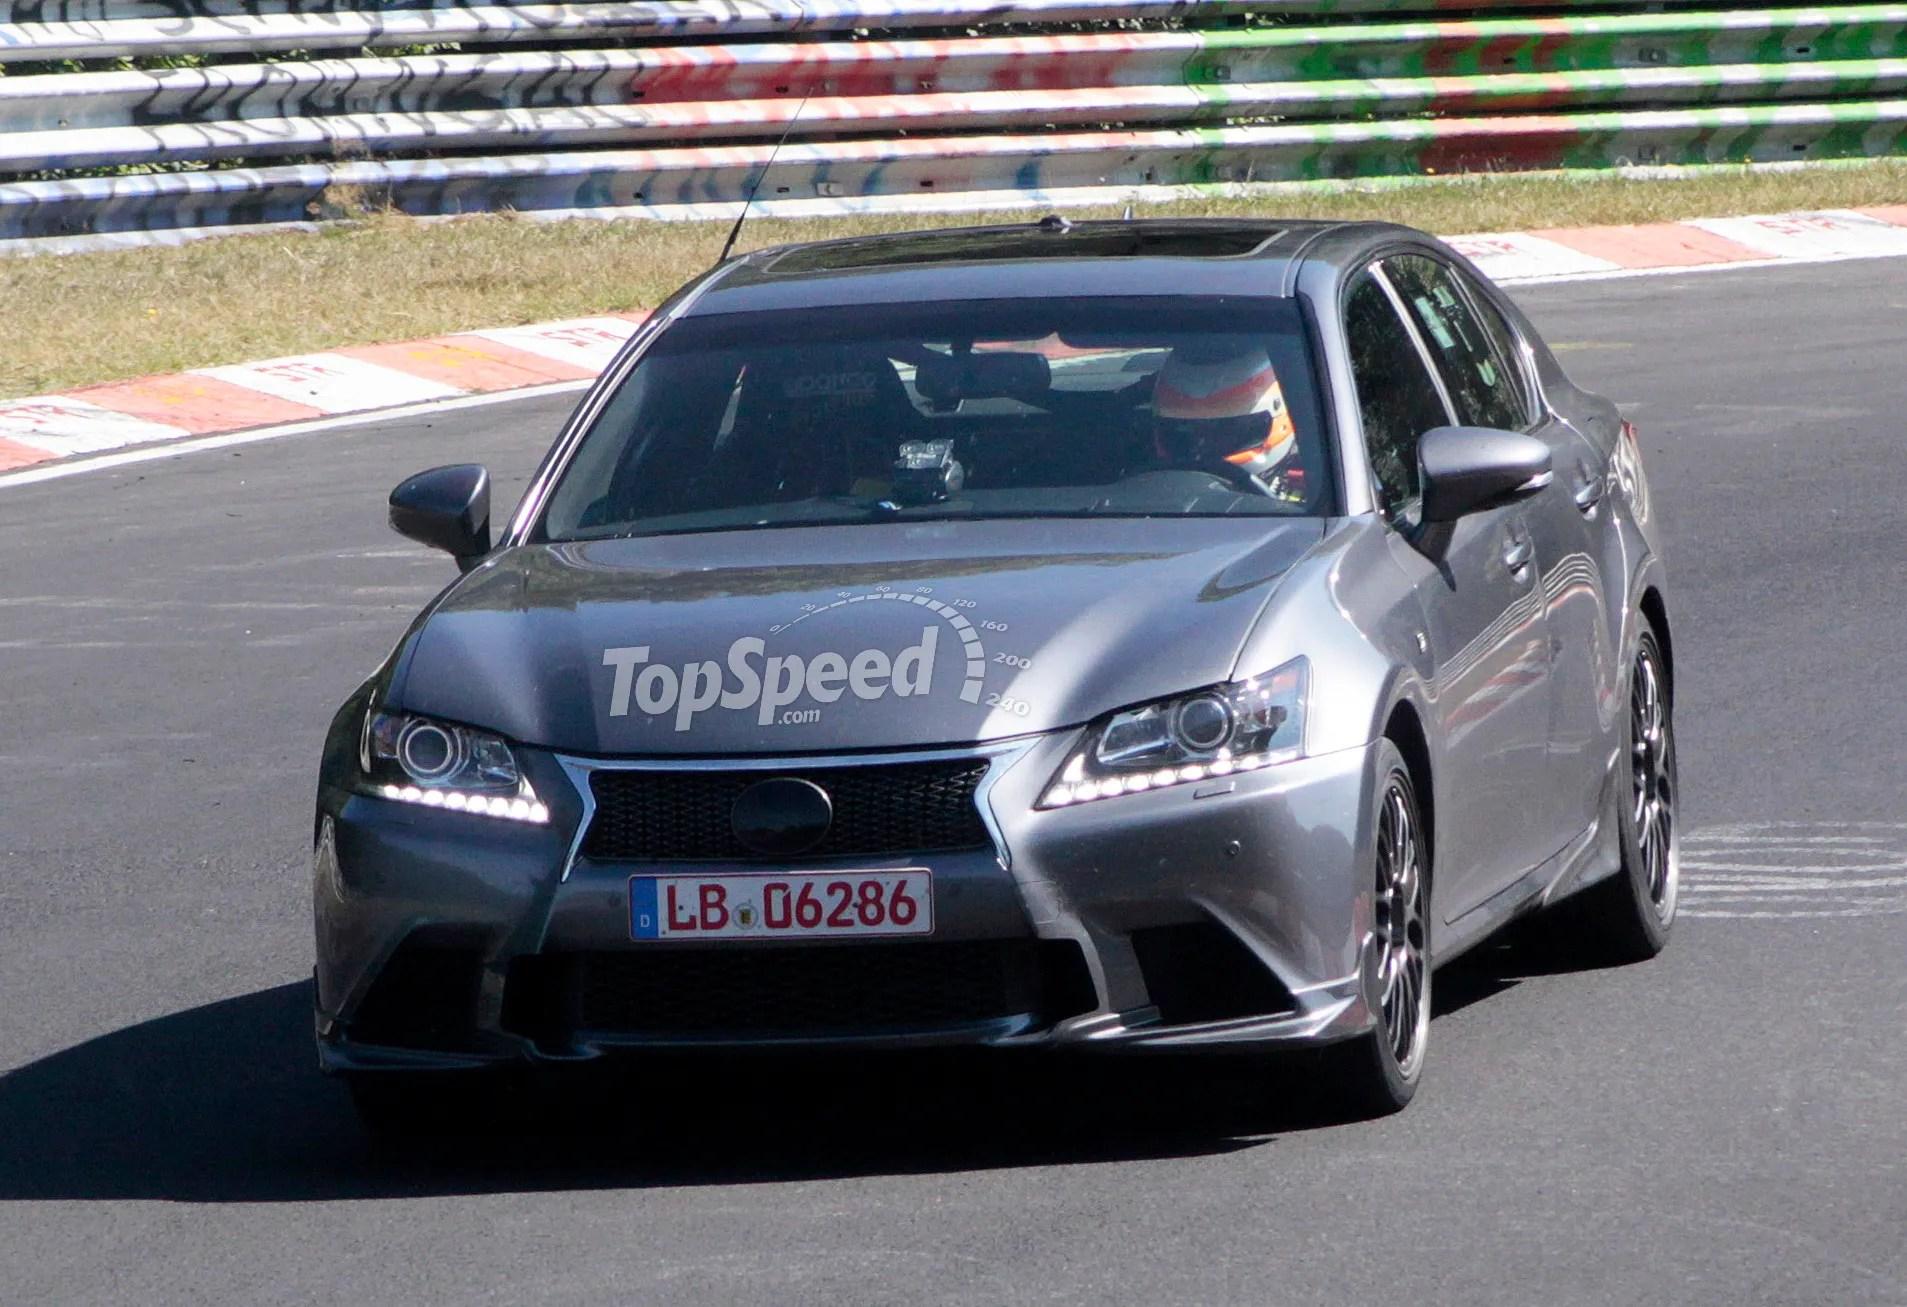 2016 Lexus GS F Review Top Speed